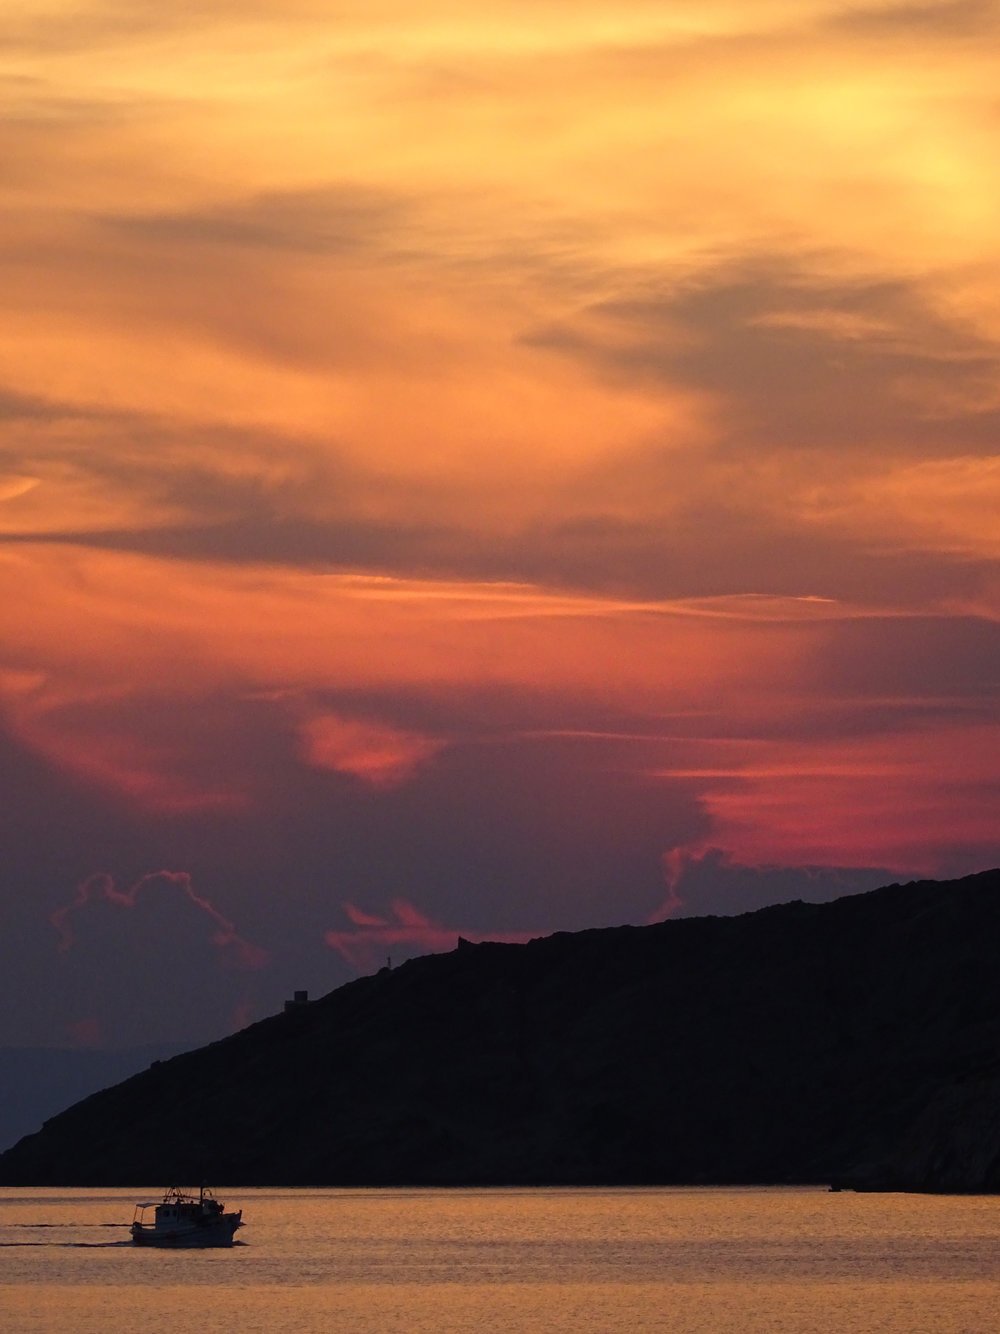 sunset_grece.jpg